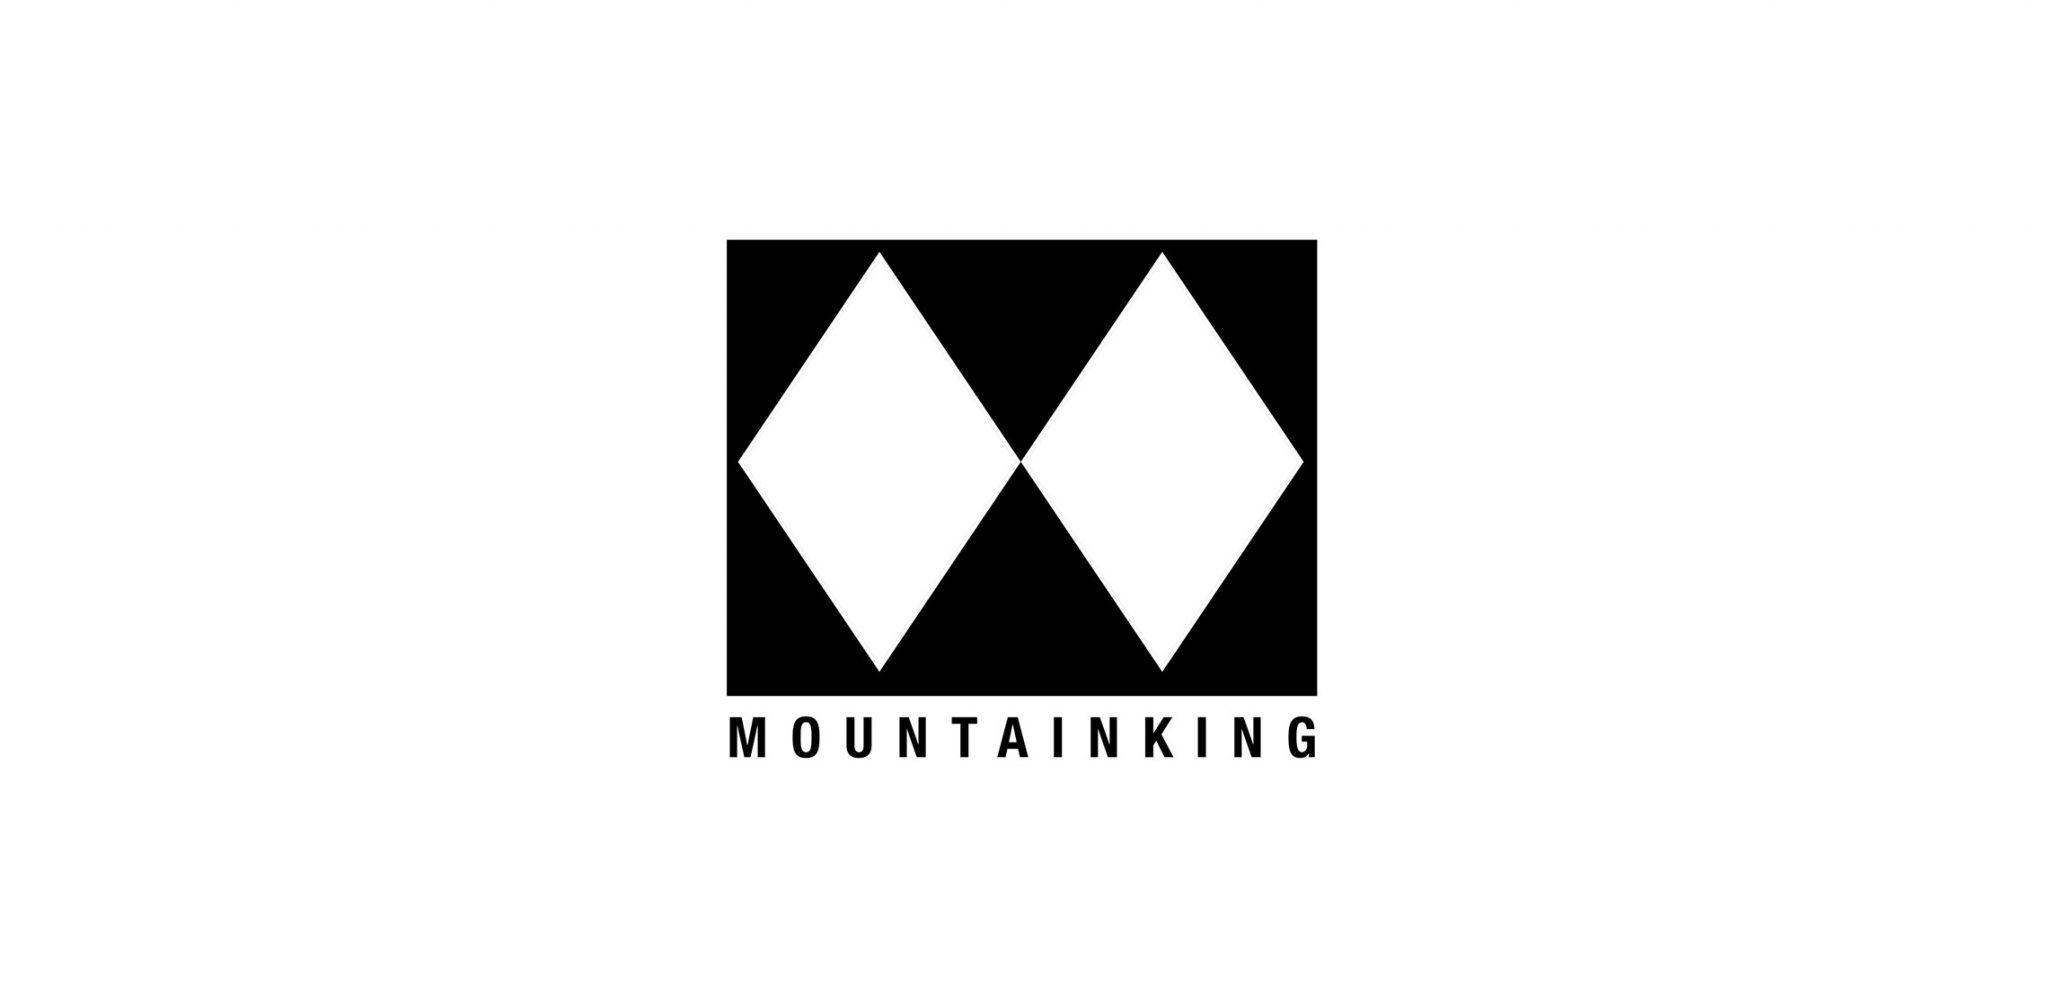 Citizenn & Ejeca Present Mountainking - Work (I Just) hero